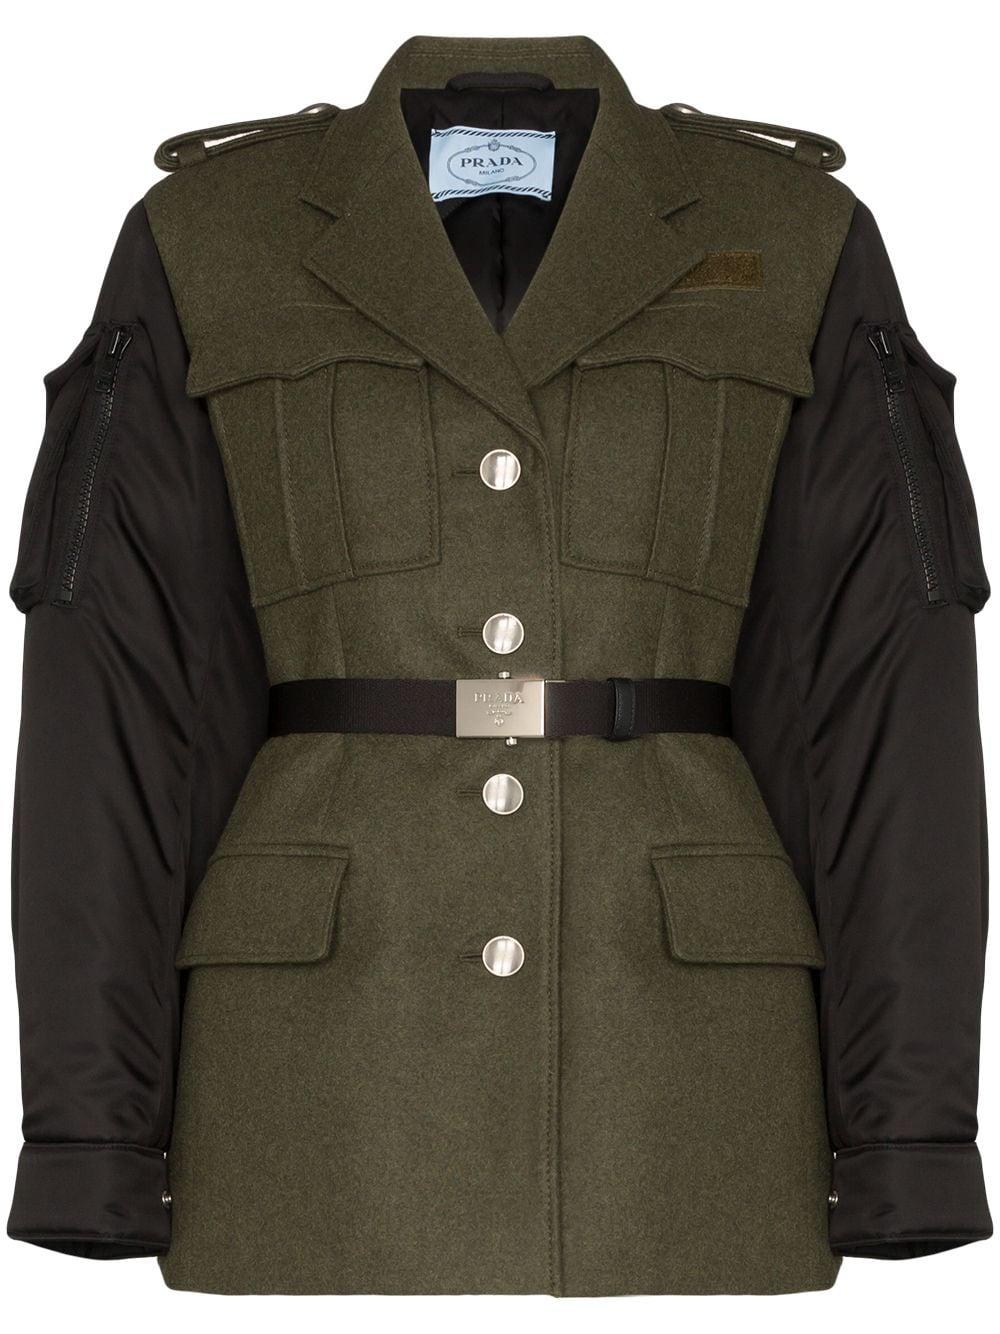 Prada Contrast Sleeve Belted Coat Farfetch Military Jacket Jackets Military Jacket Green [ 1334 x 1000 Pixel ]